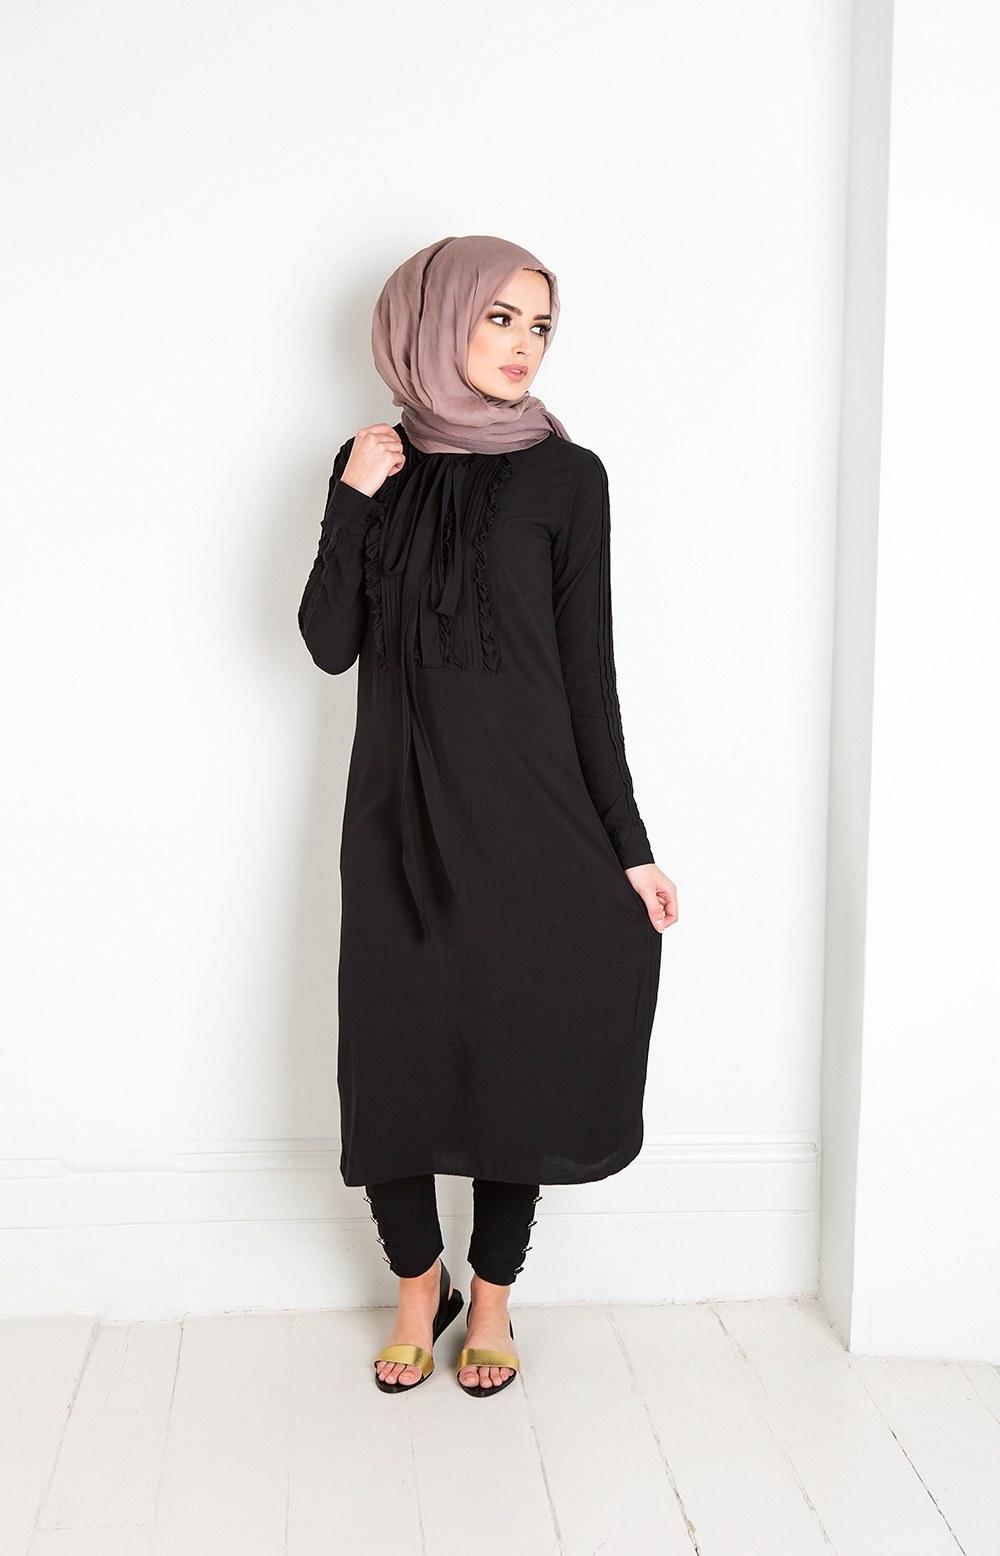 Inspirasi Model Baju Lebaran Budm 25 Trend Model Baju Muslim Lebaran 2018 Simple & Modis